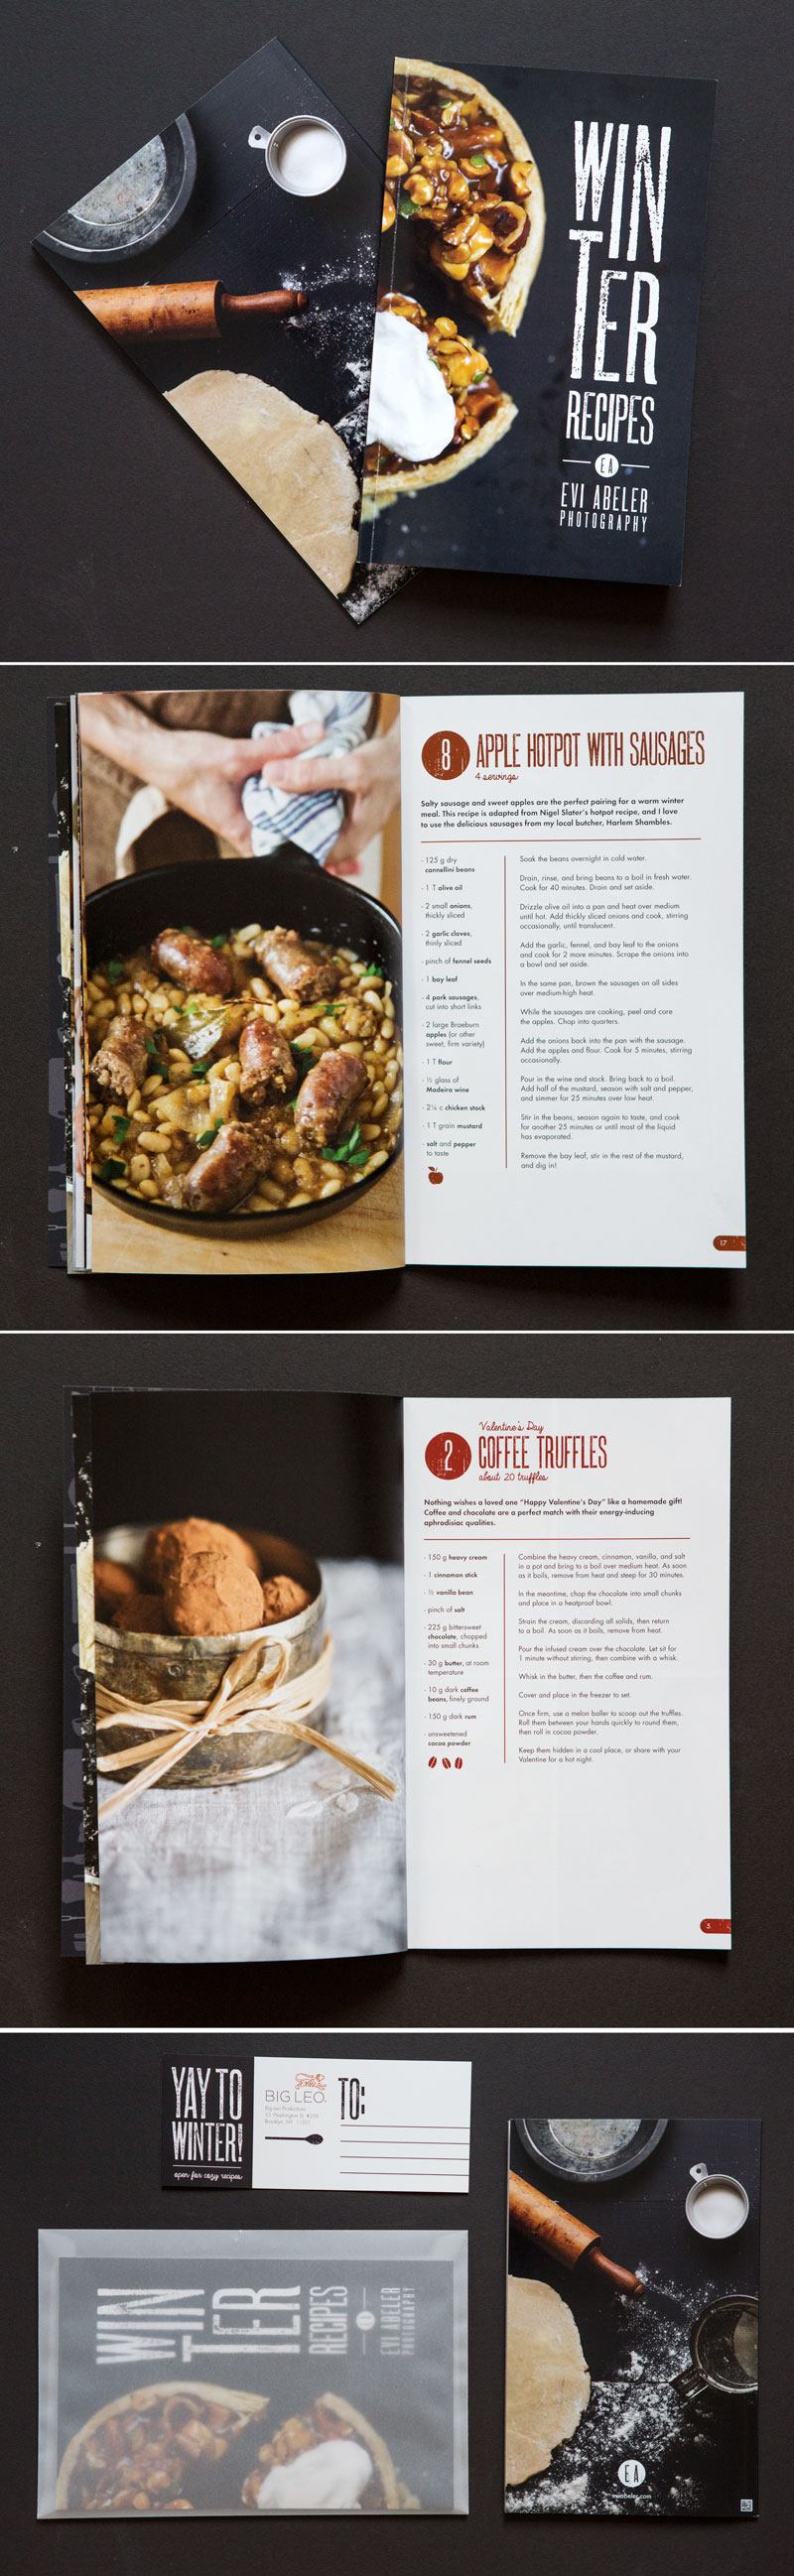 Evi-Abeler-Food-Photography-New-York